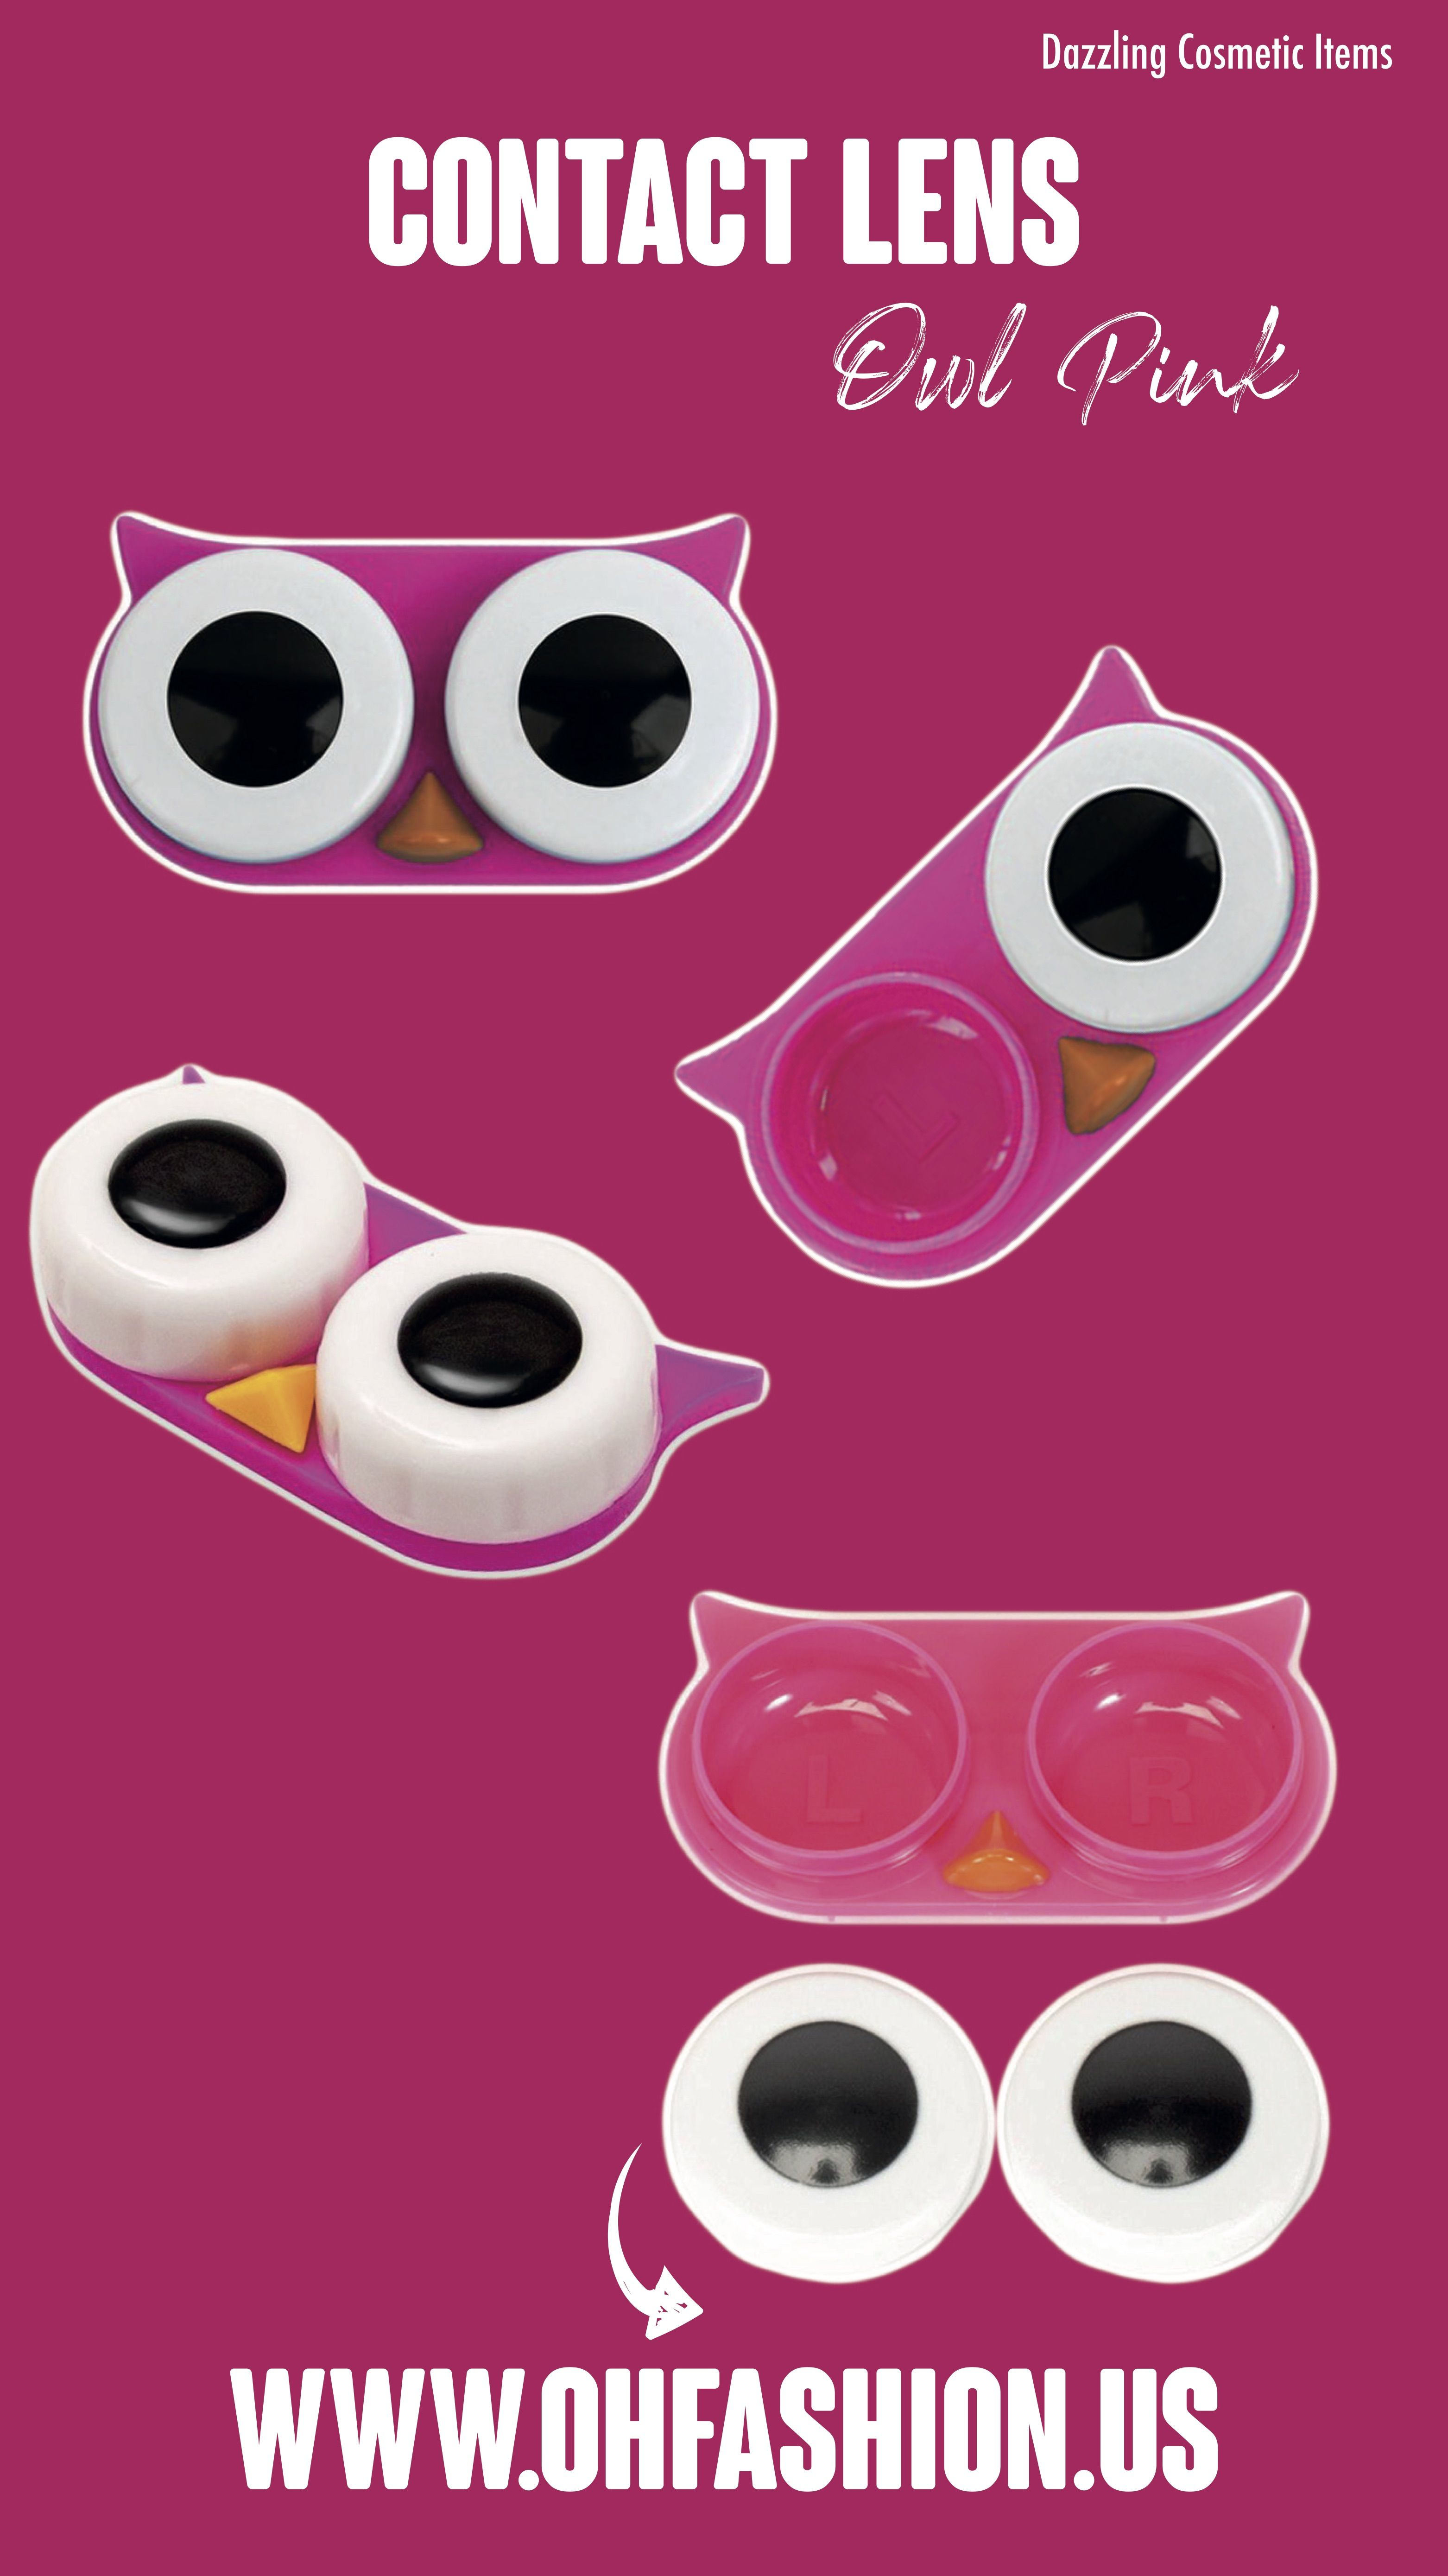 Contact lens case owl pink contact lenses case fashion